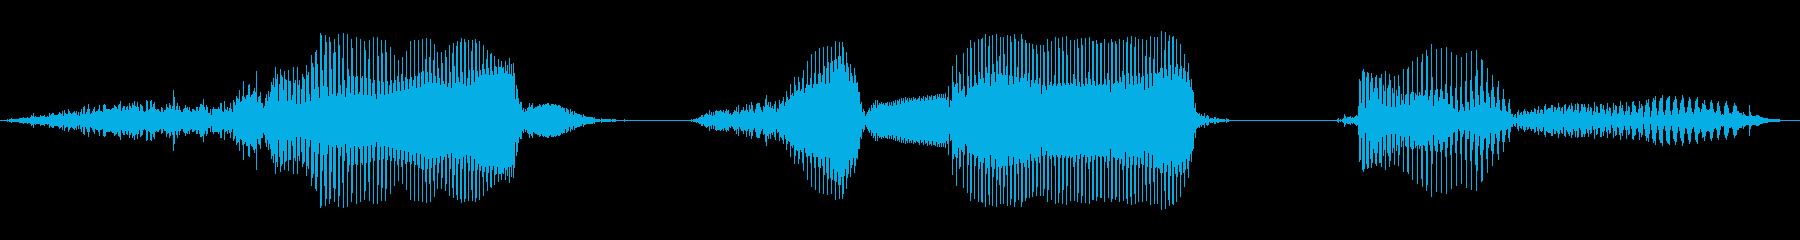 cm(センチメートル)の再生済みの波形